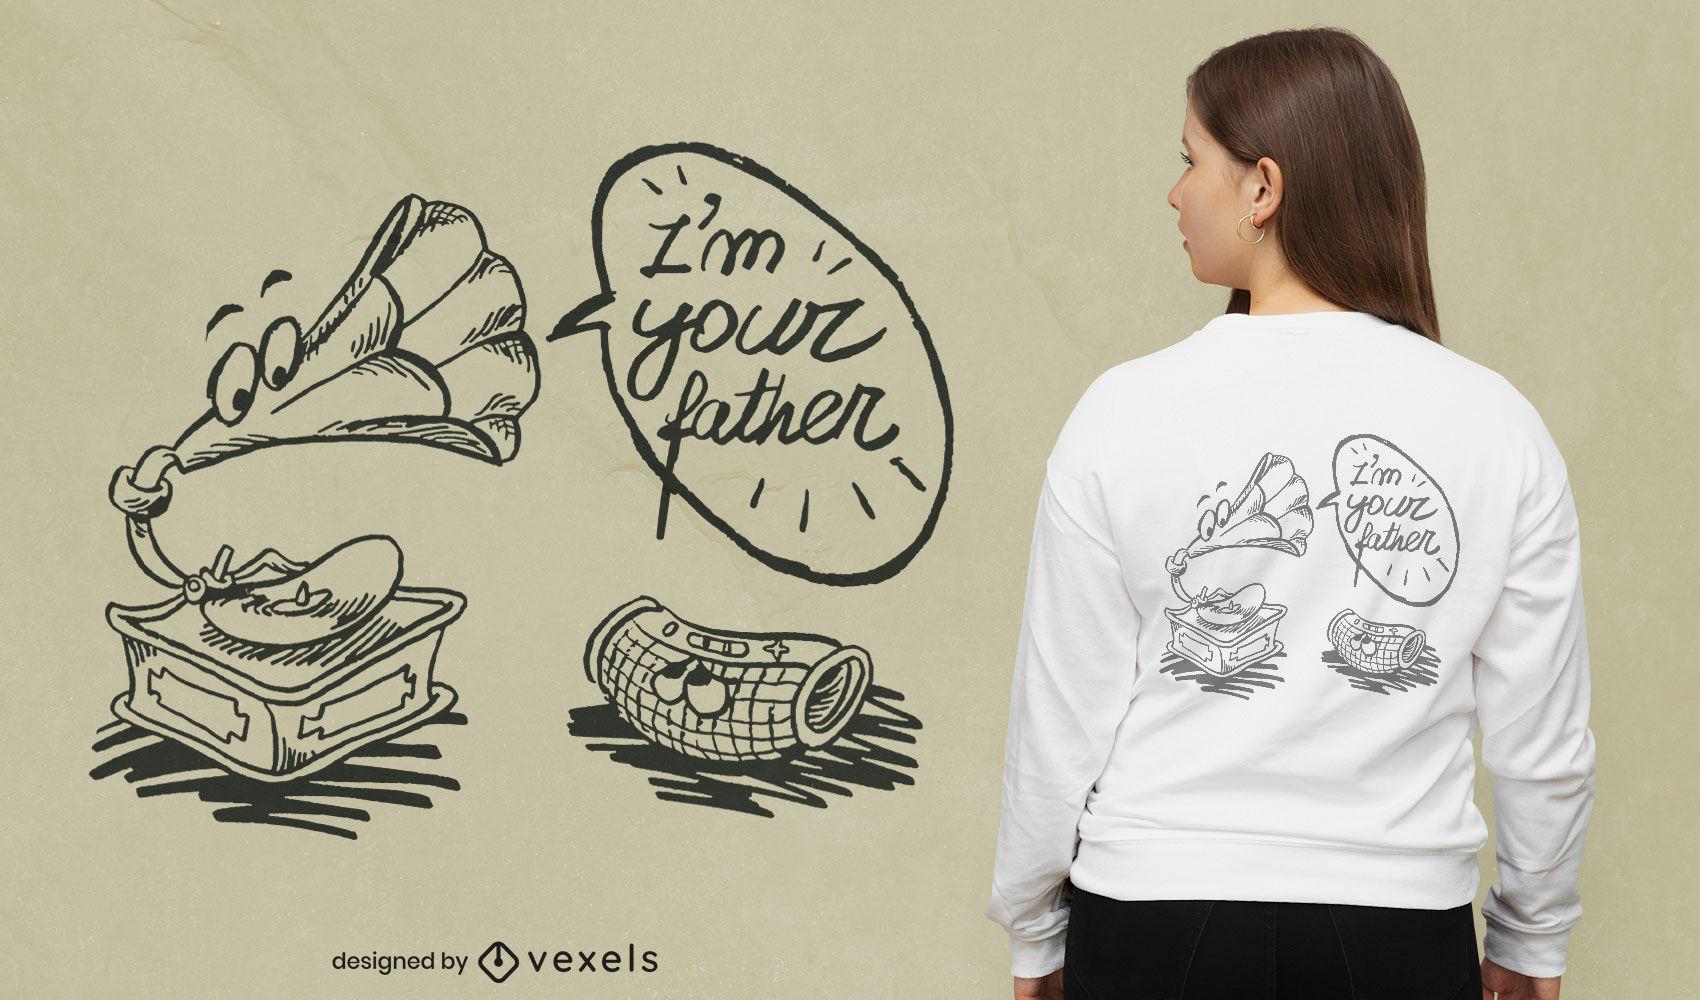 Funny music t-shirt design